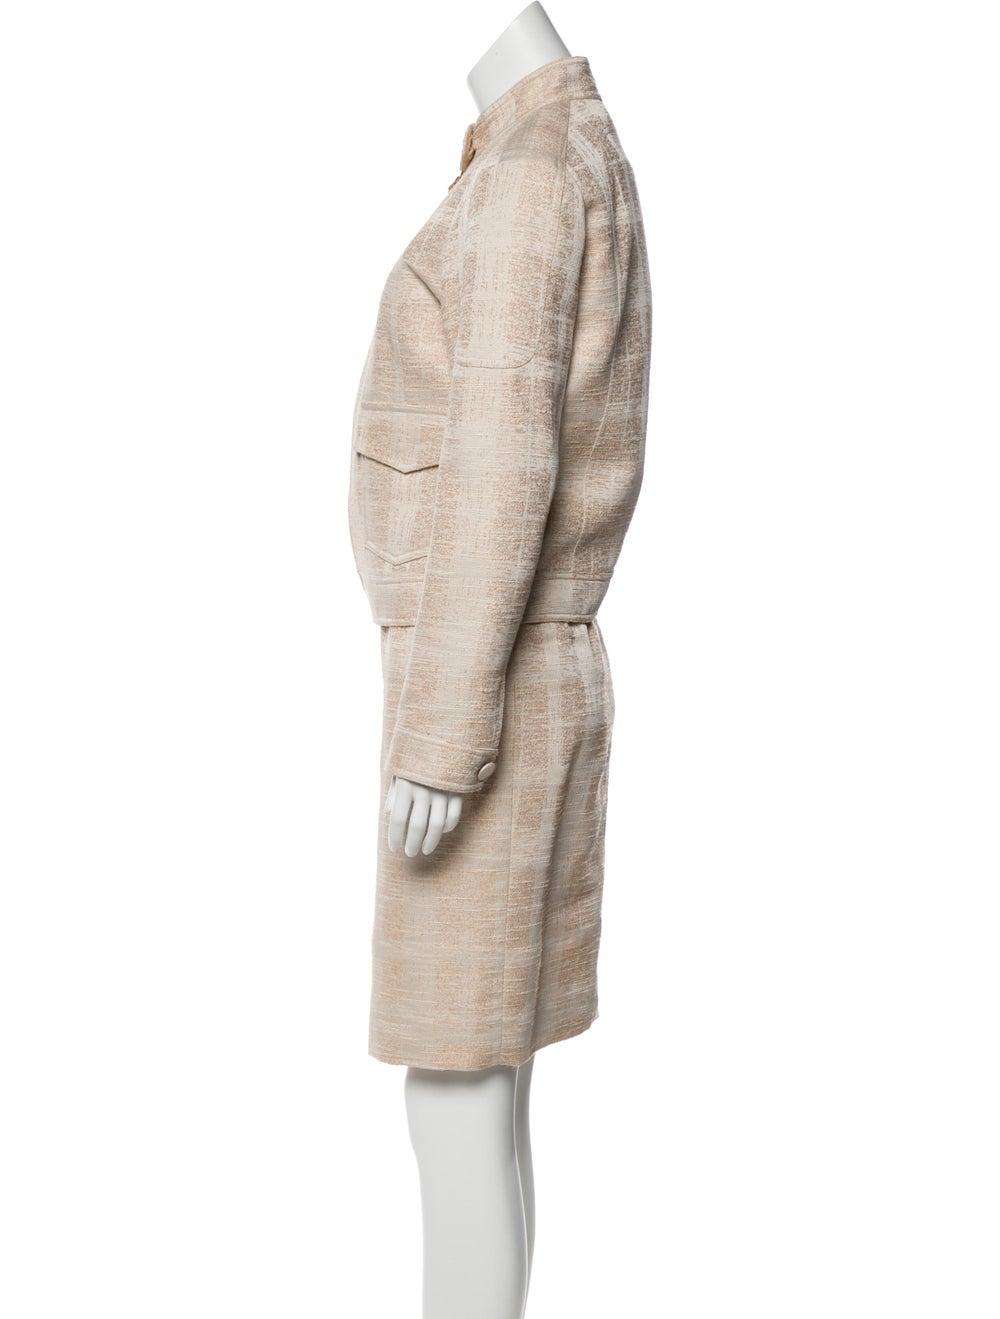 Tory Burch Tweed Pattern Dress Set - image 2